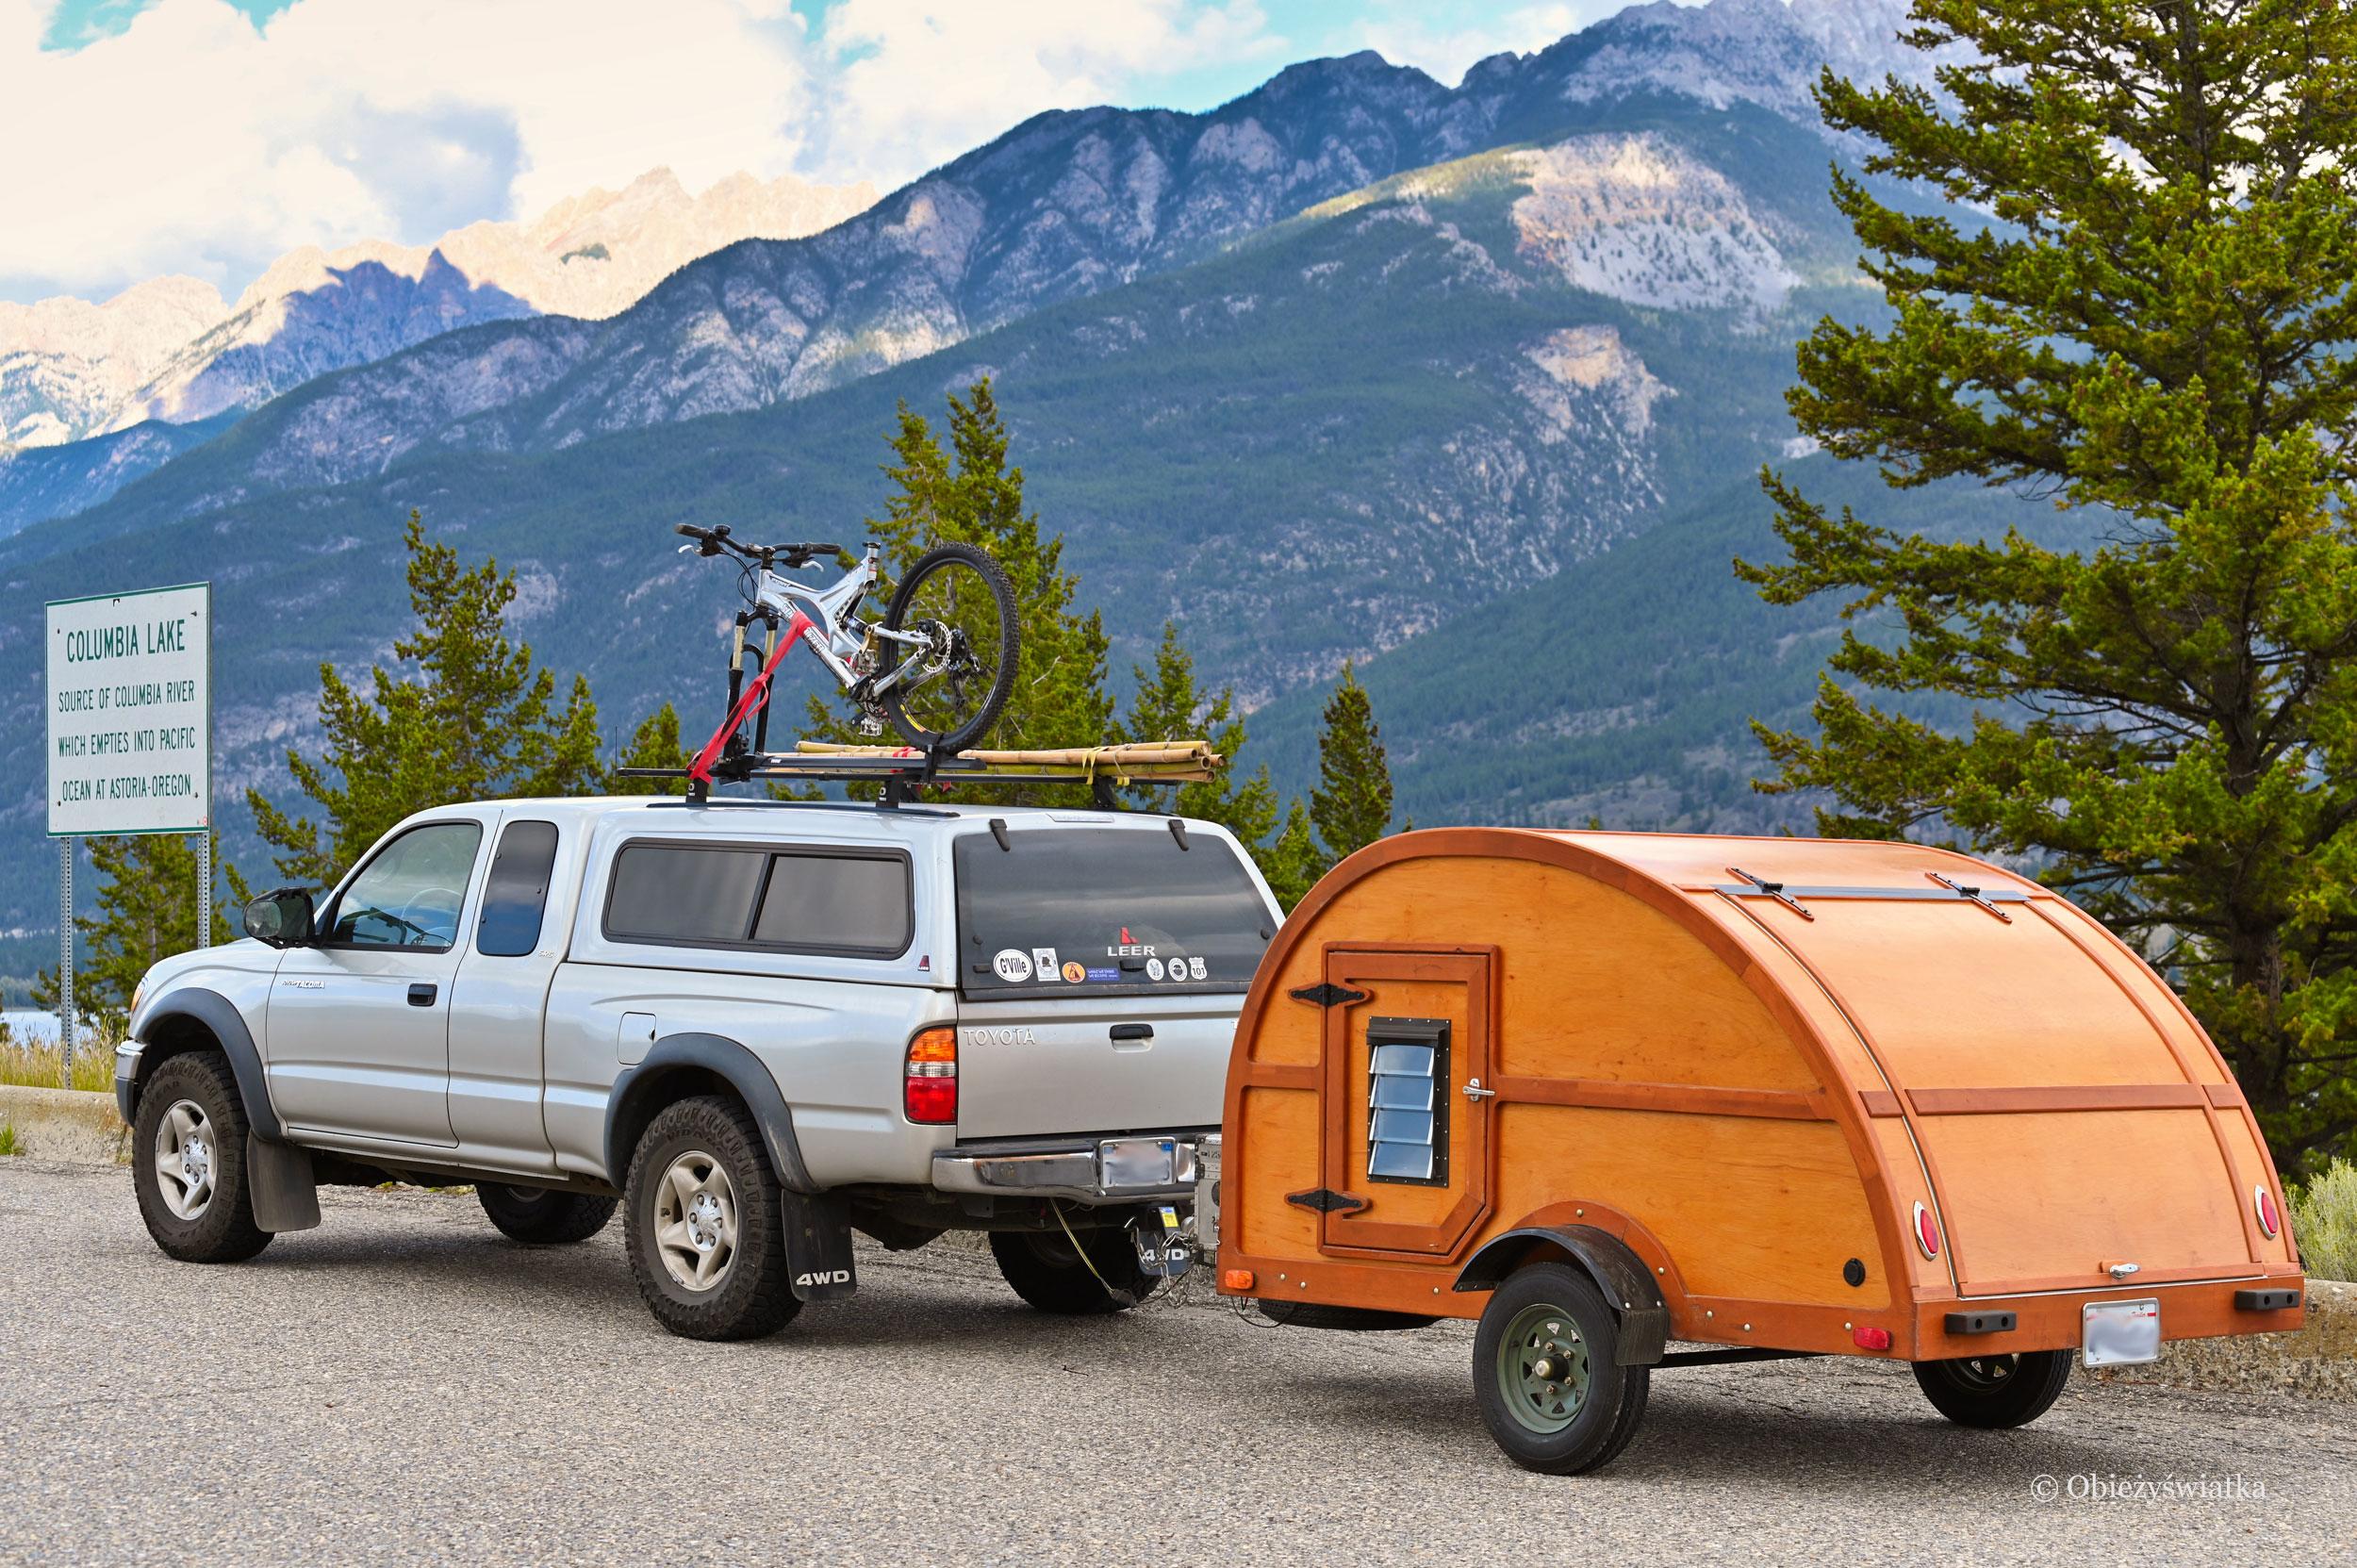 Camping, Columbia Lake, Canada